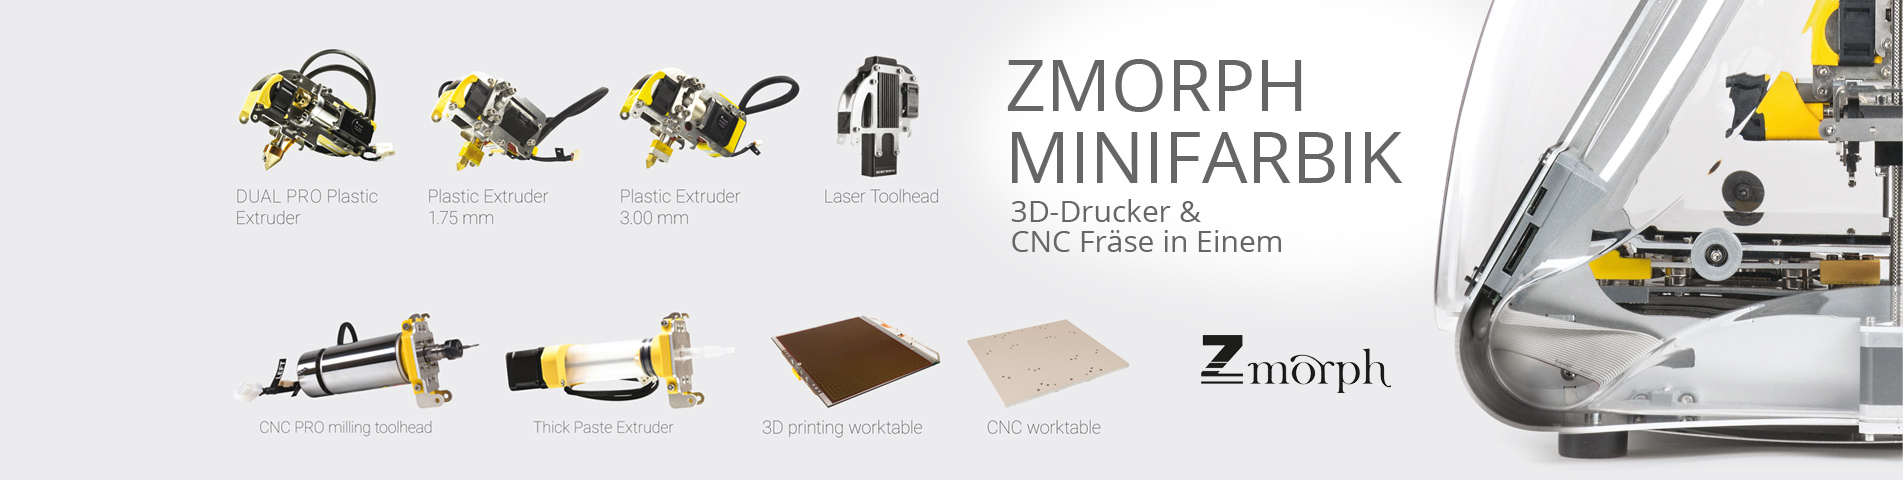 Zmorph 2.0 SX